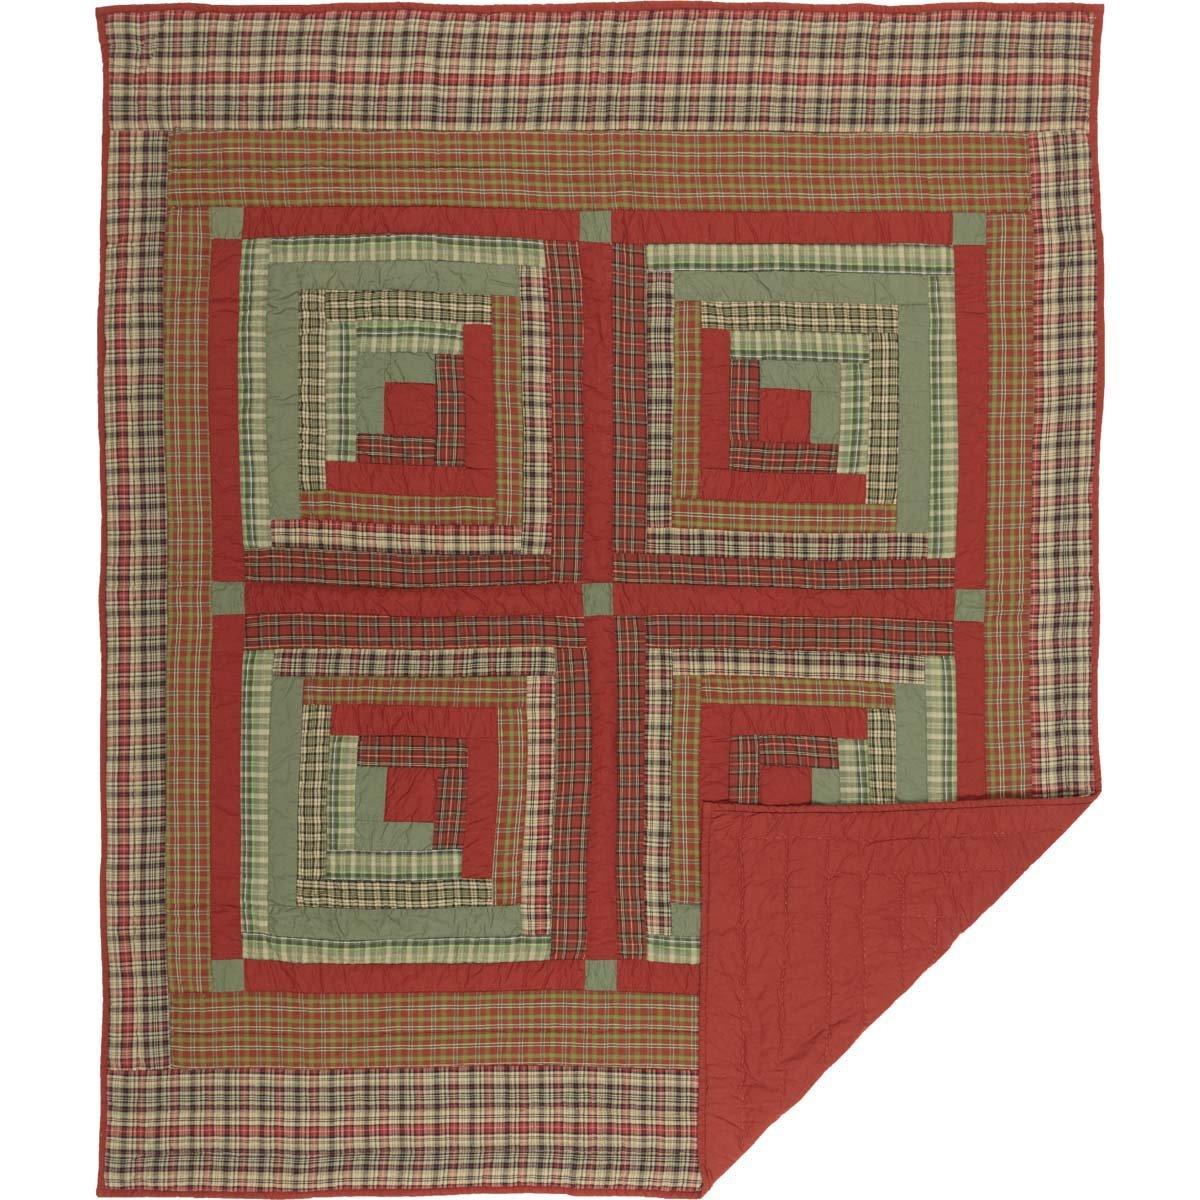 VHC Brands Seasonal Decor Gatlinburg Red Quilted Throw 44775